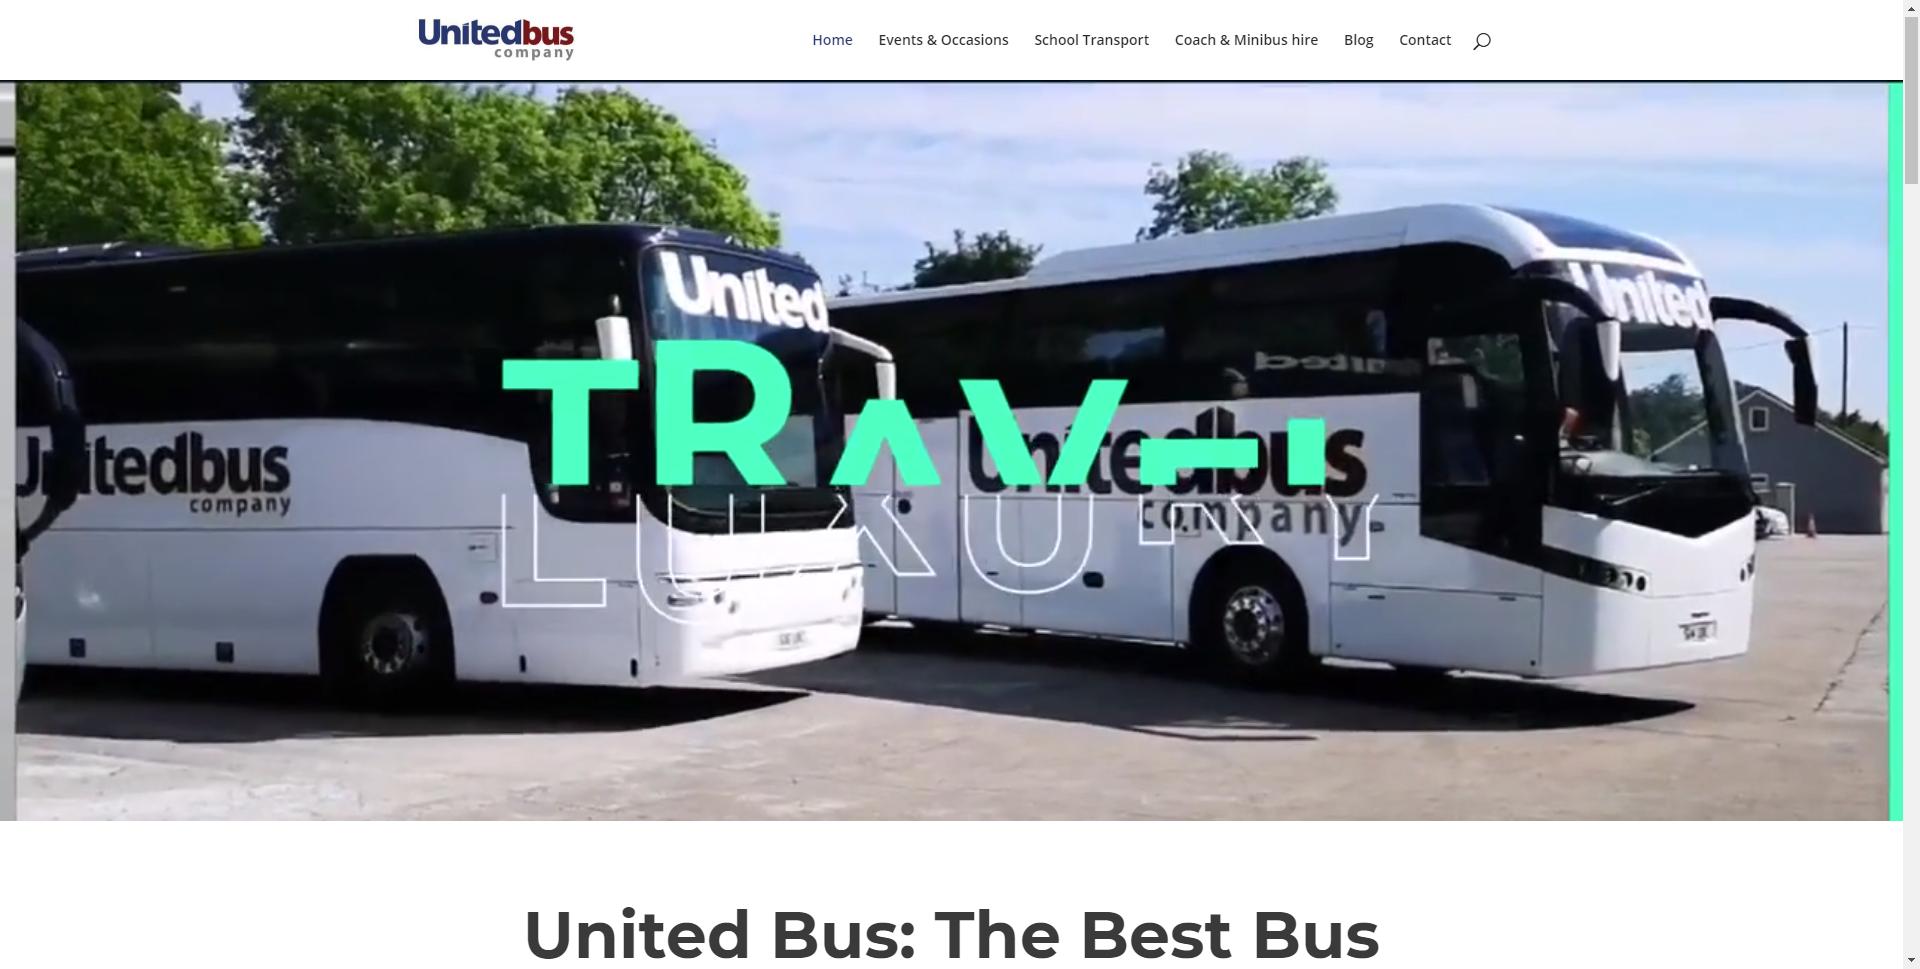 www.unitedbuscompany.com Websites